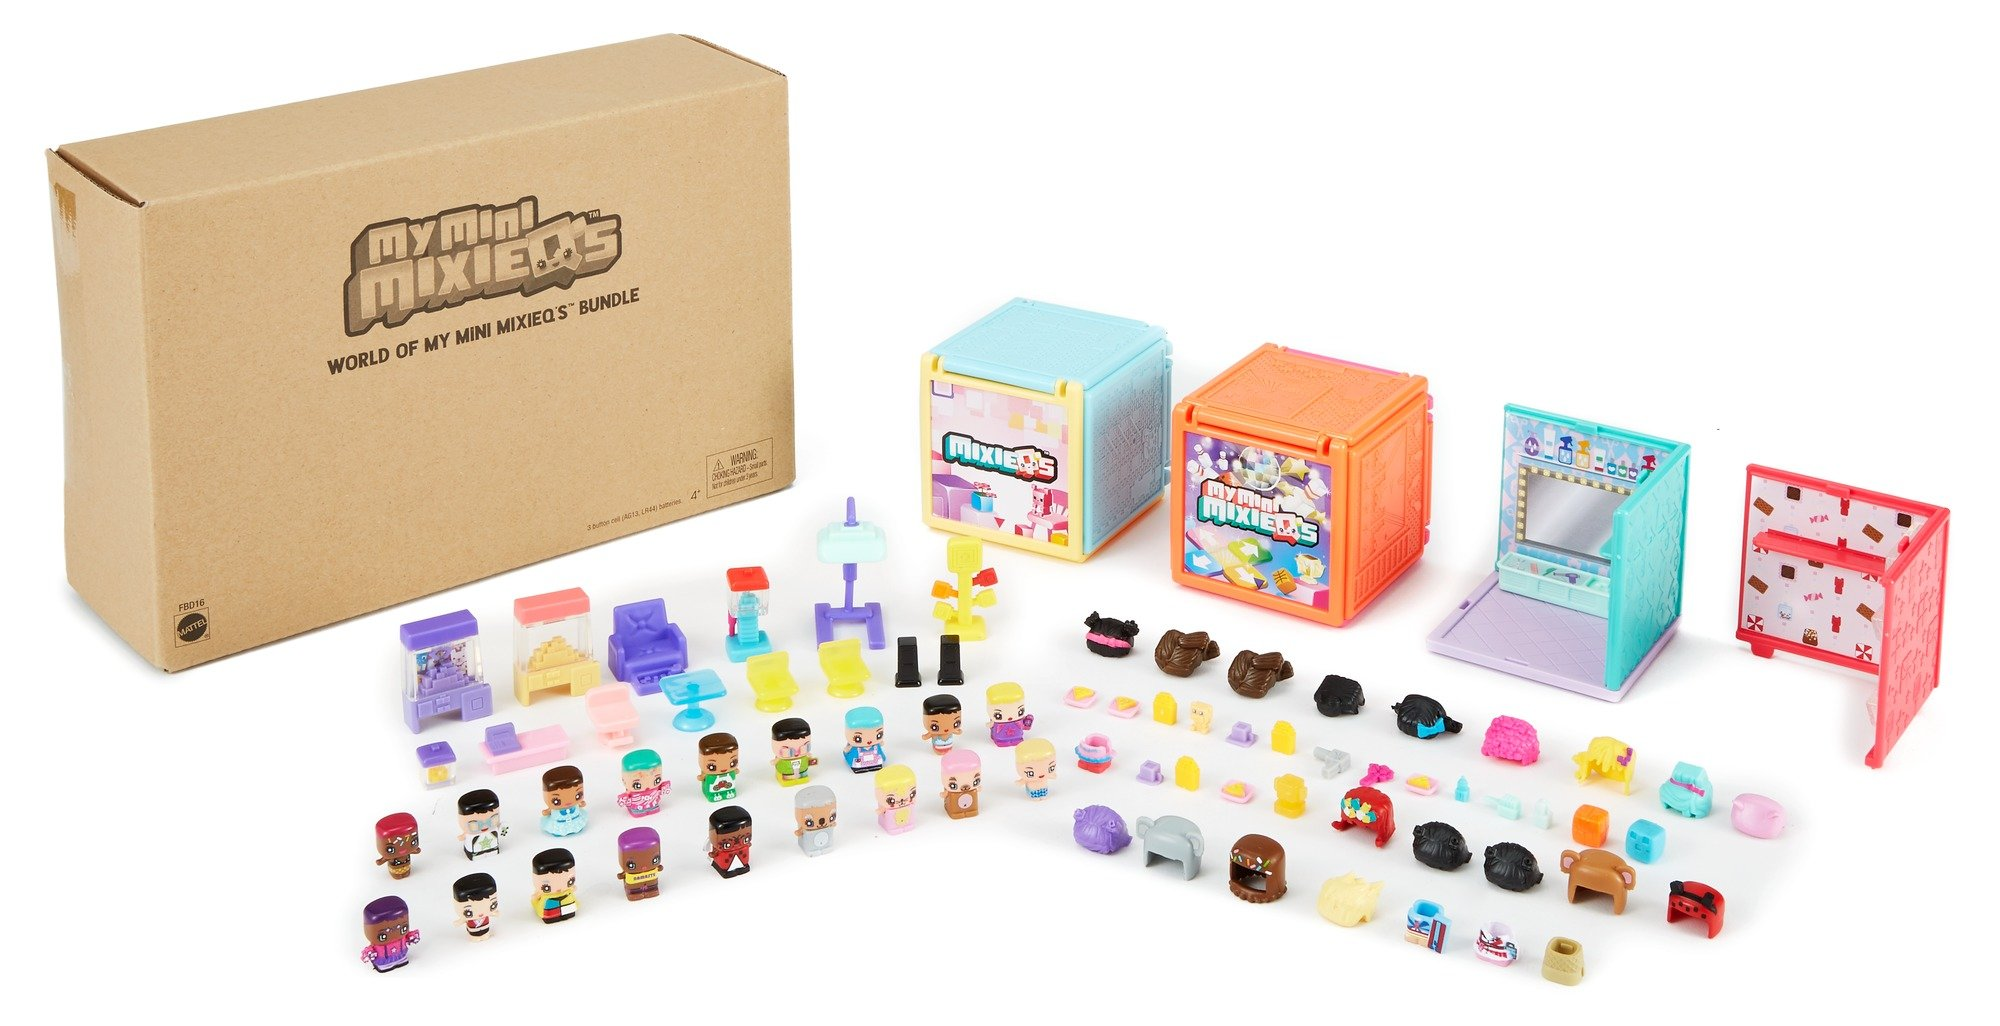 My Mini MixieQ's Bundle - Mini Rooms, Playsets, and Figures by My Mini MixieQ's (Image #5)